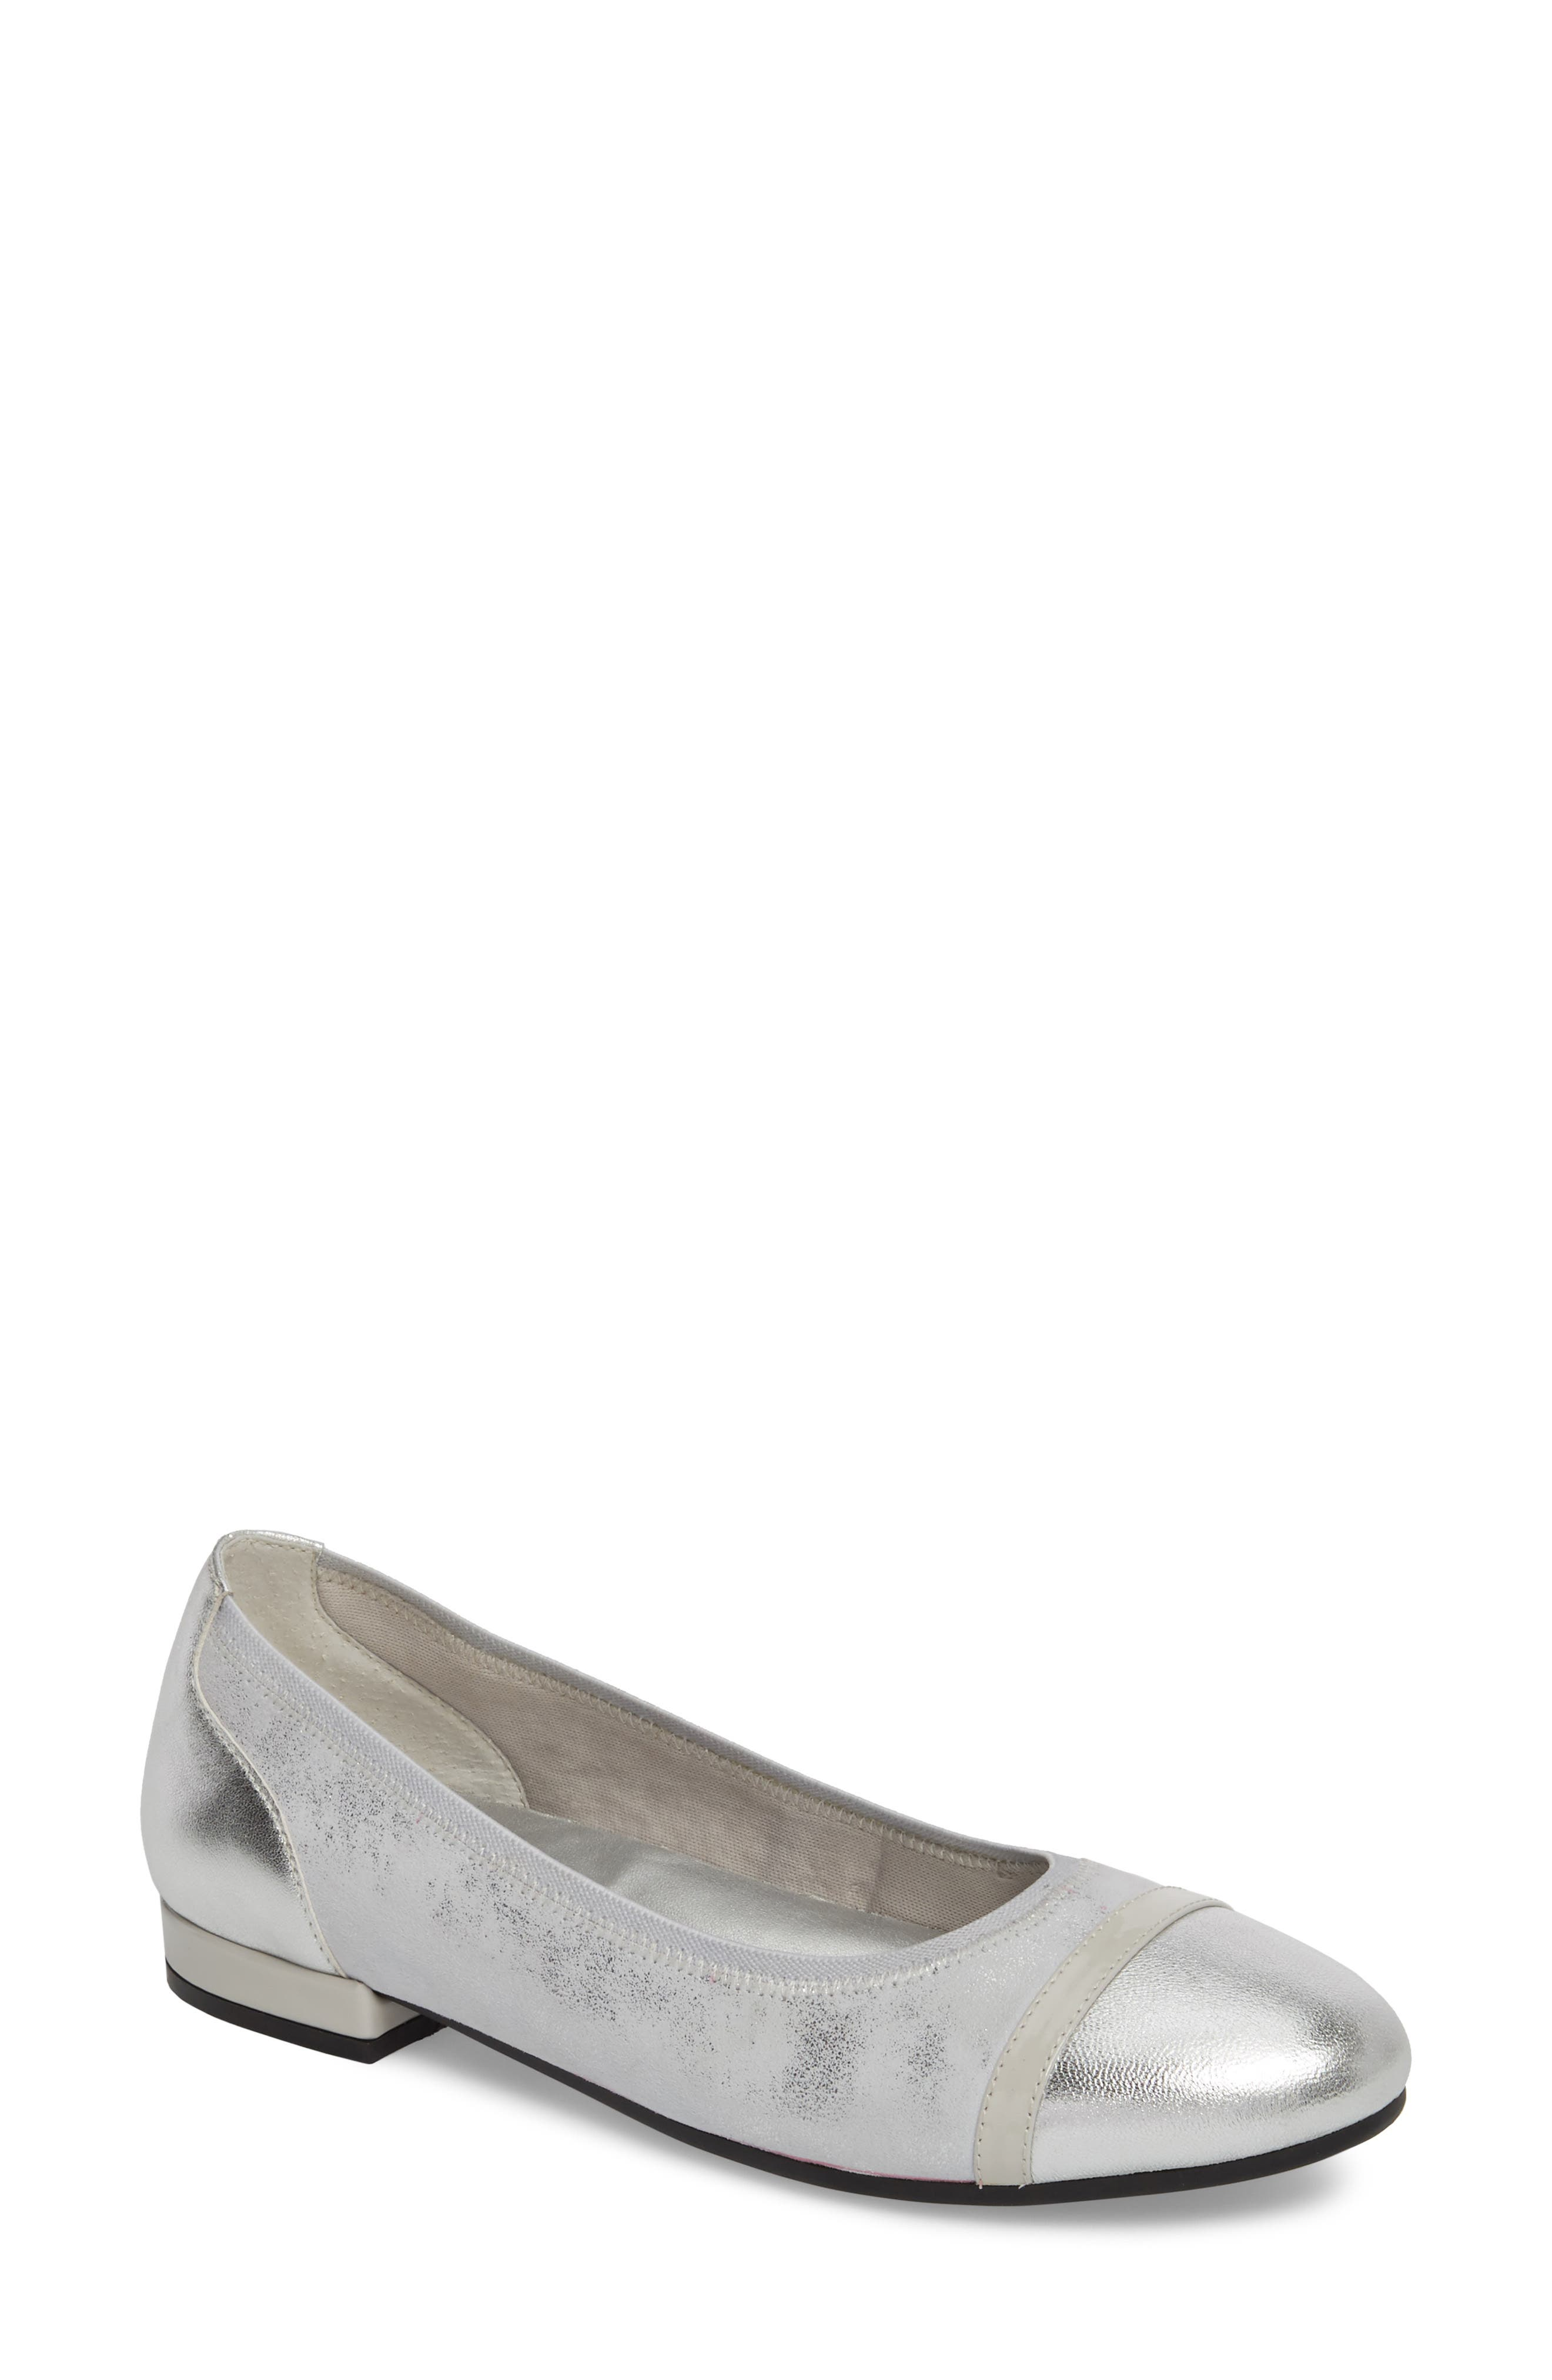 David Tate Luscious Flat, Grey